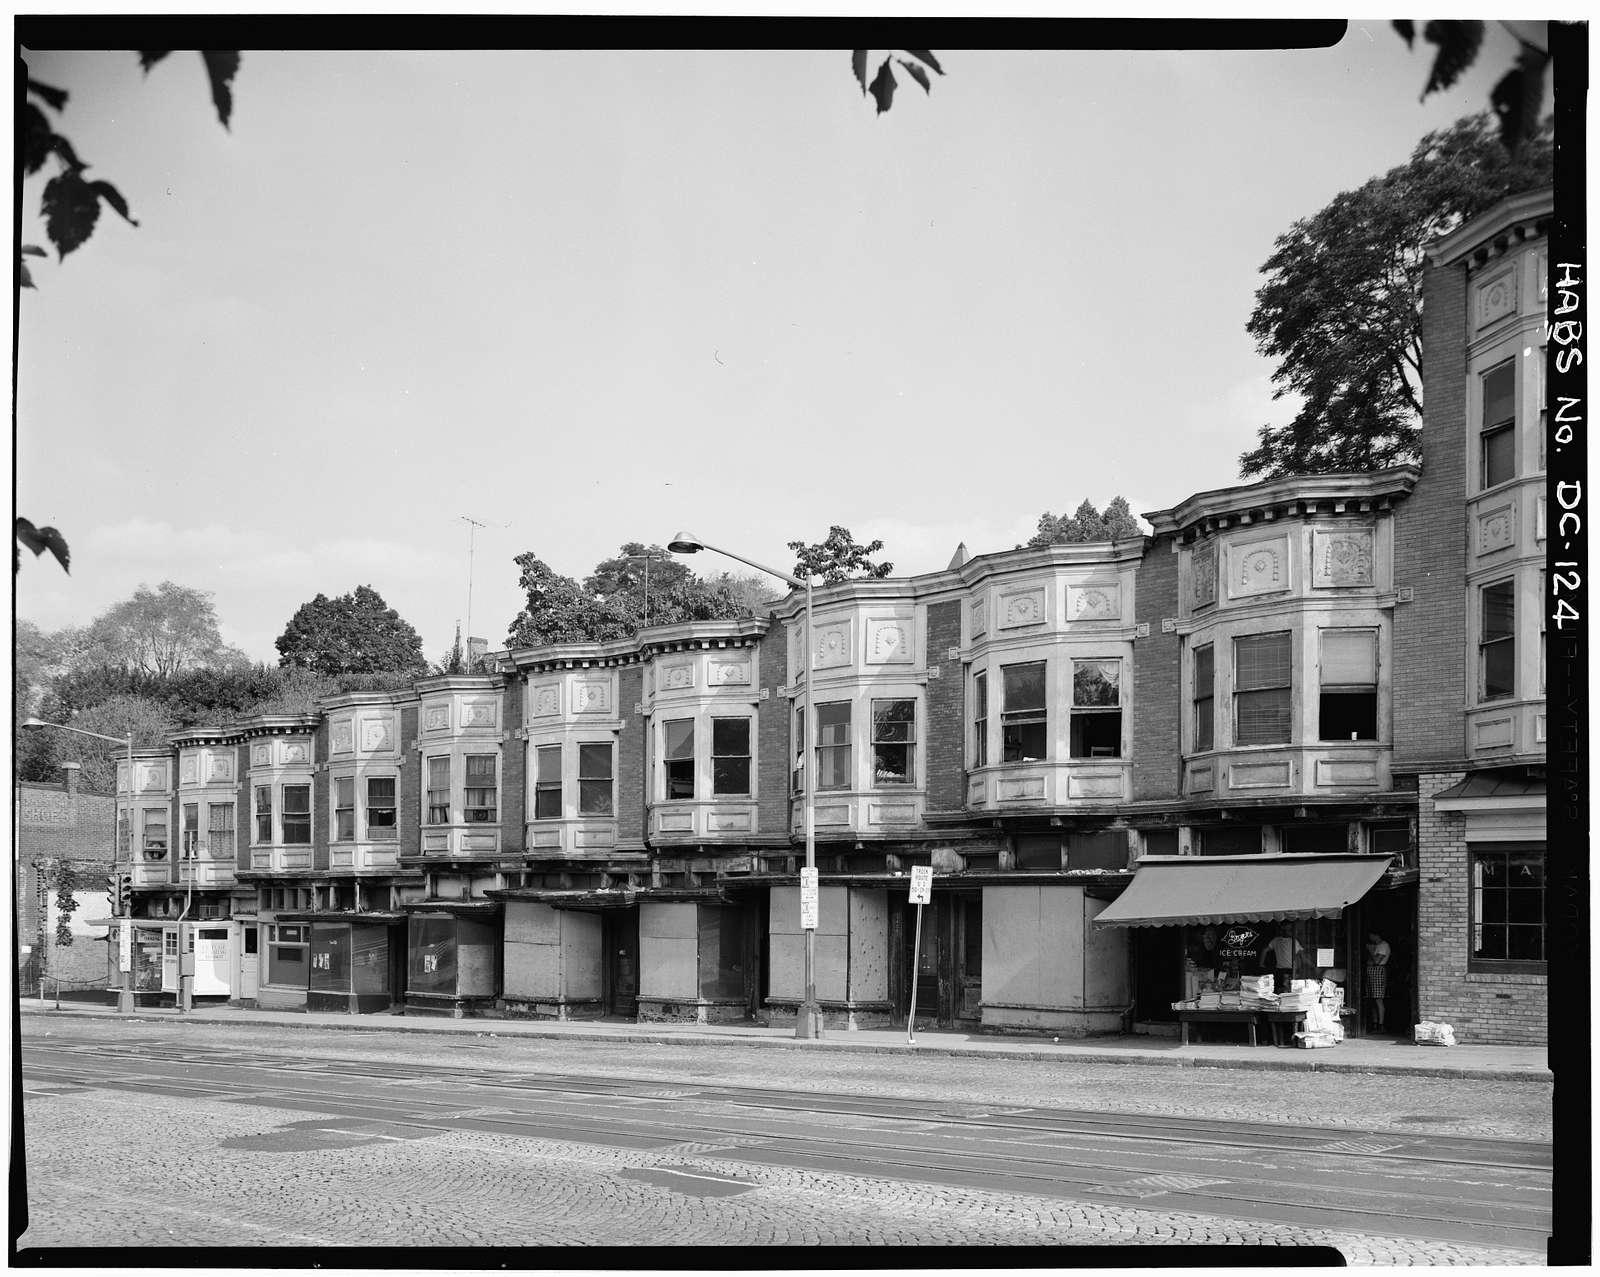 Eynon Building, 3407 M Street Northwest, Washington, District of Columbia, DC